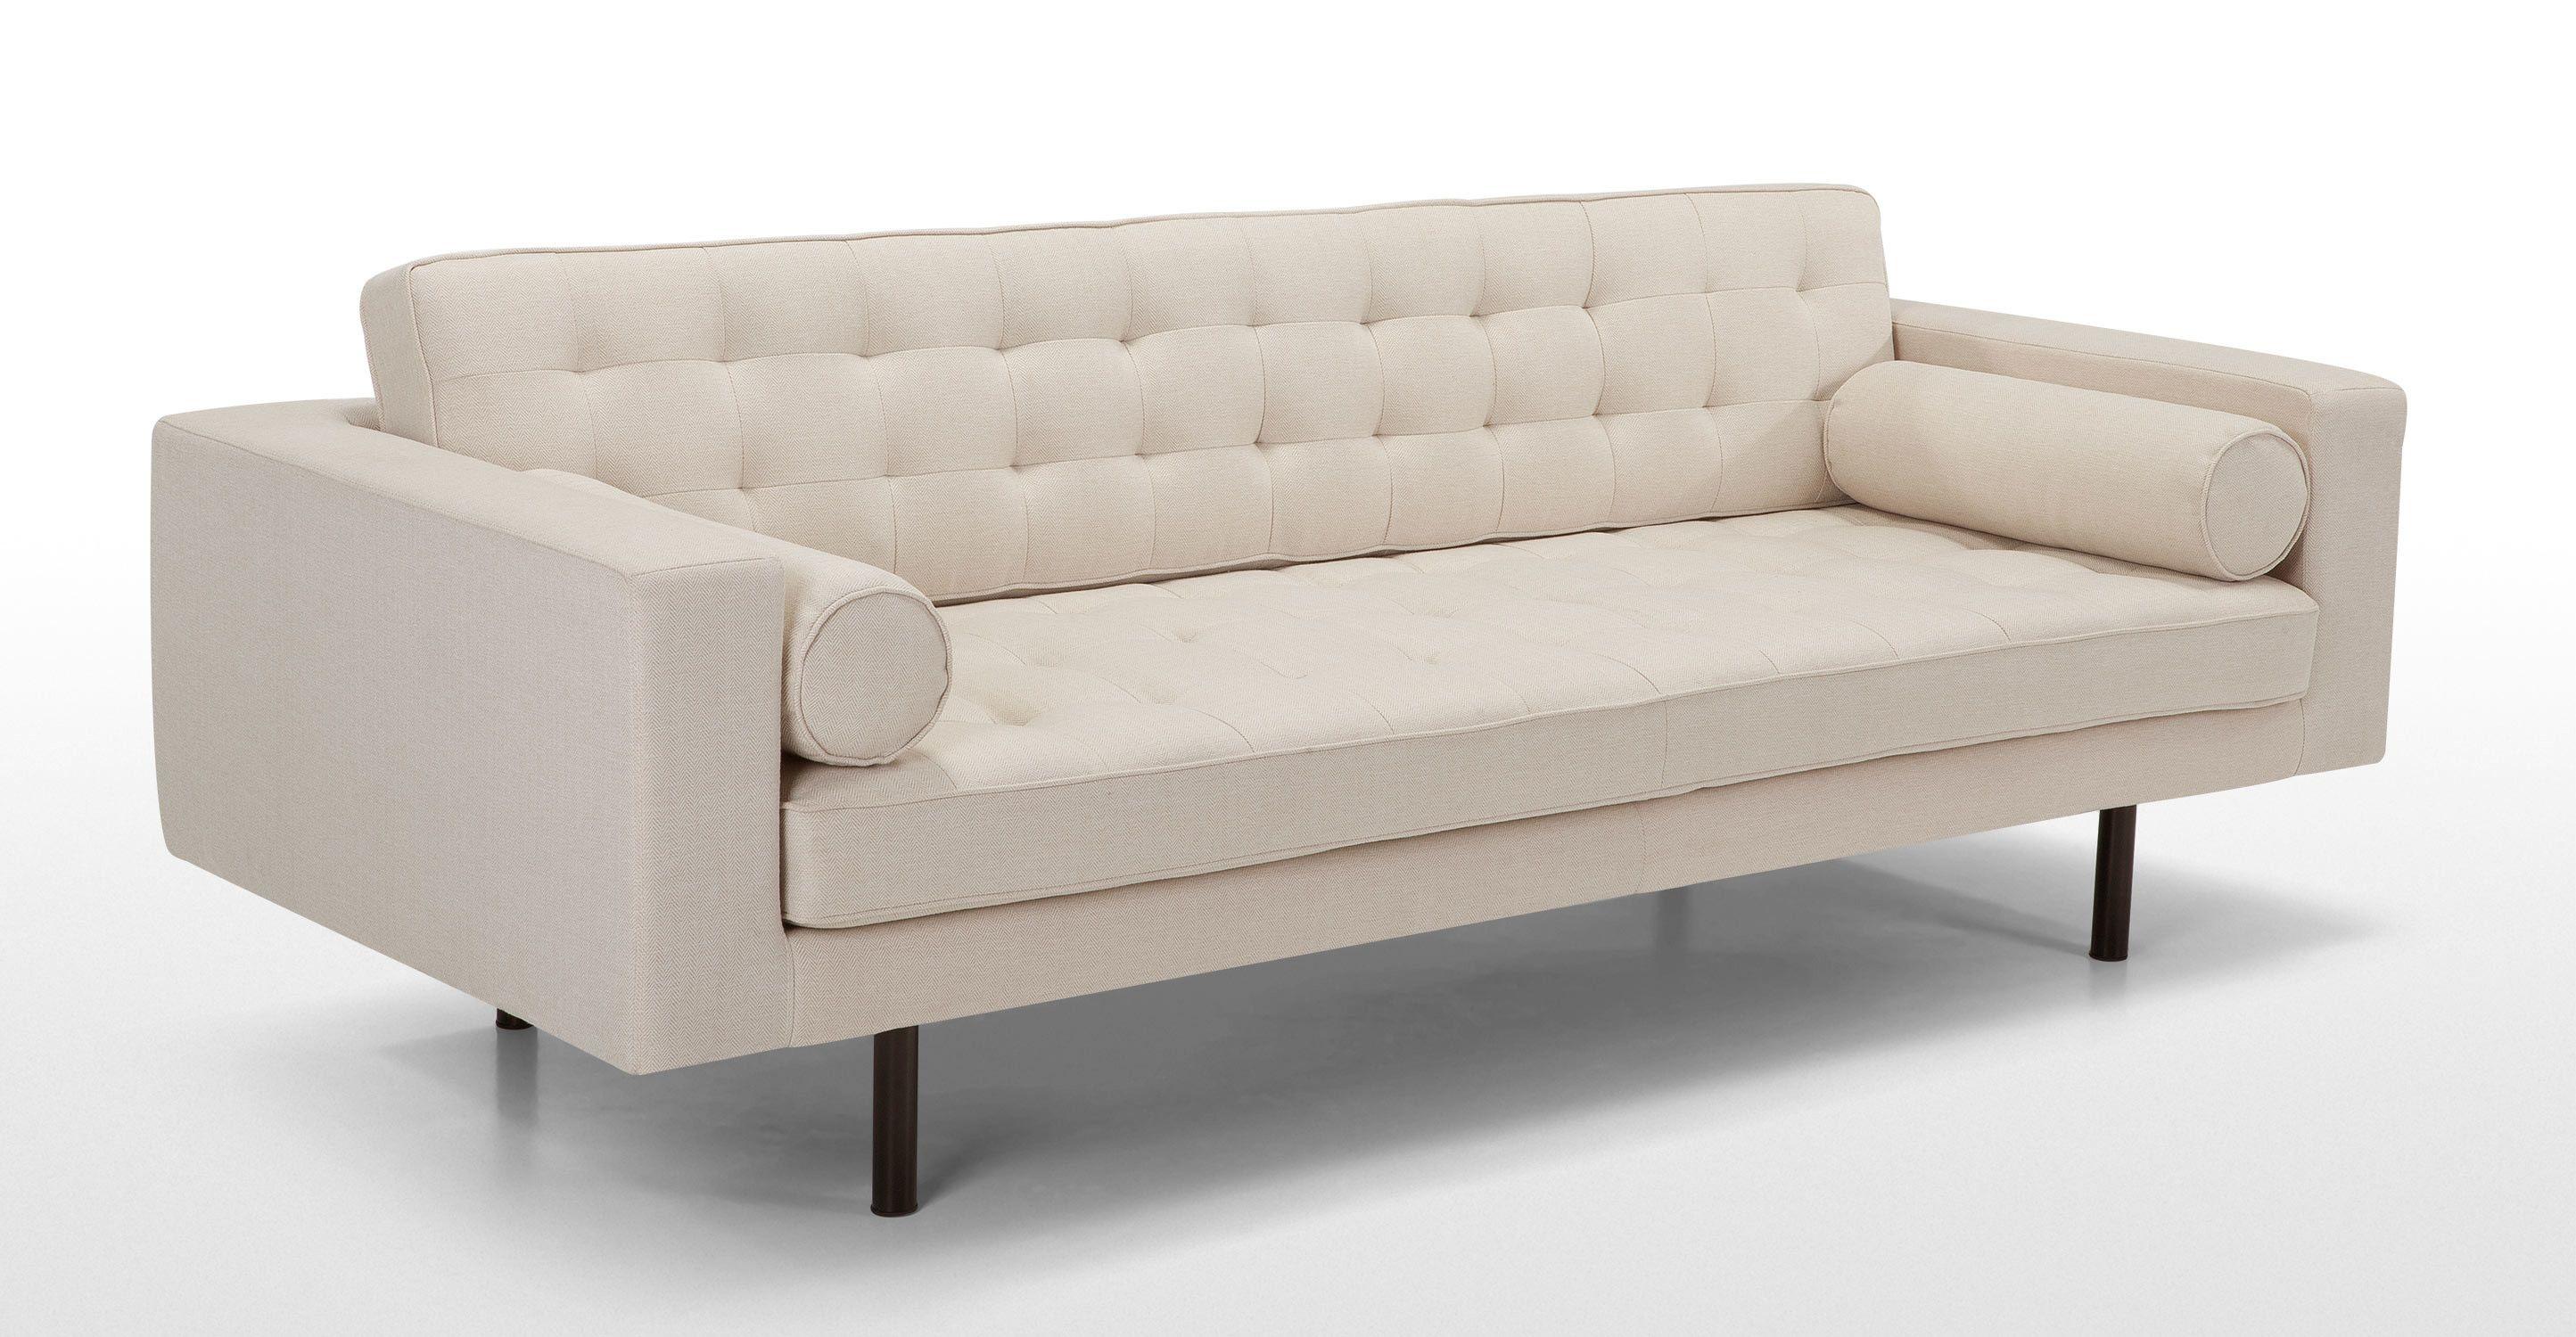 Fielding 3 Sitzer Sofa Naturbeige Mit Fischgratmuster 3 Seater Sofa Sofa Furniture Inspiration